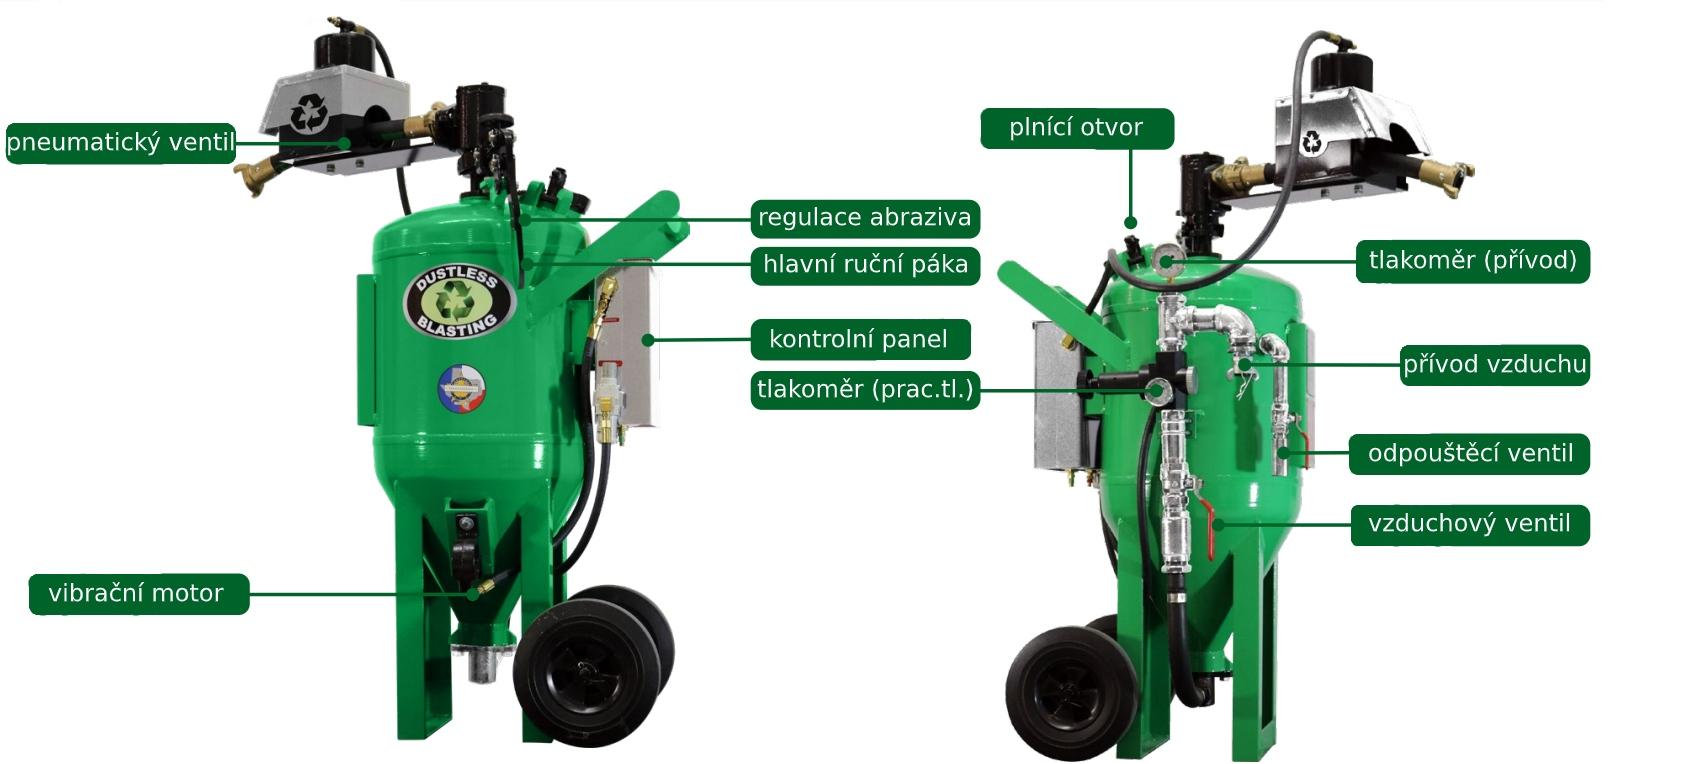 mobilni-vodni-tryskaci-zarizeni-dustless-blasting-db225-schema